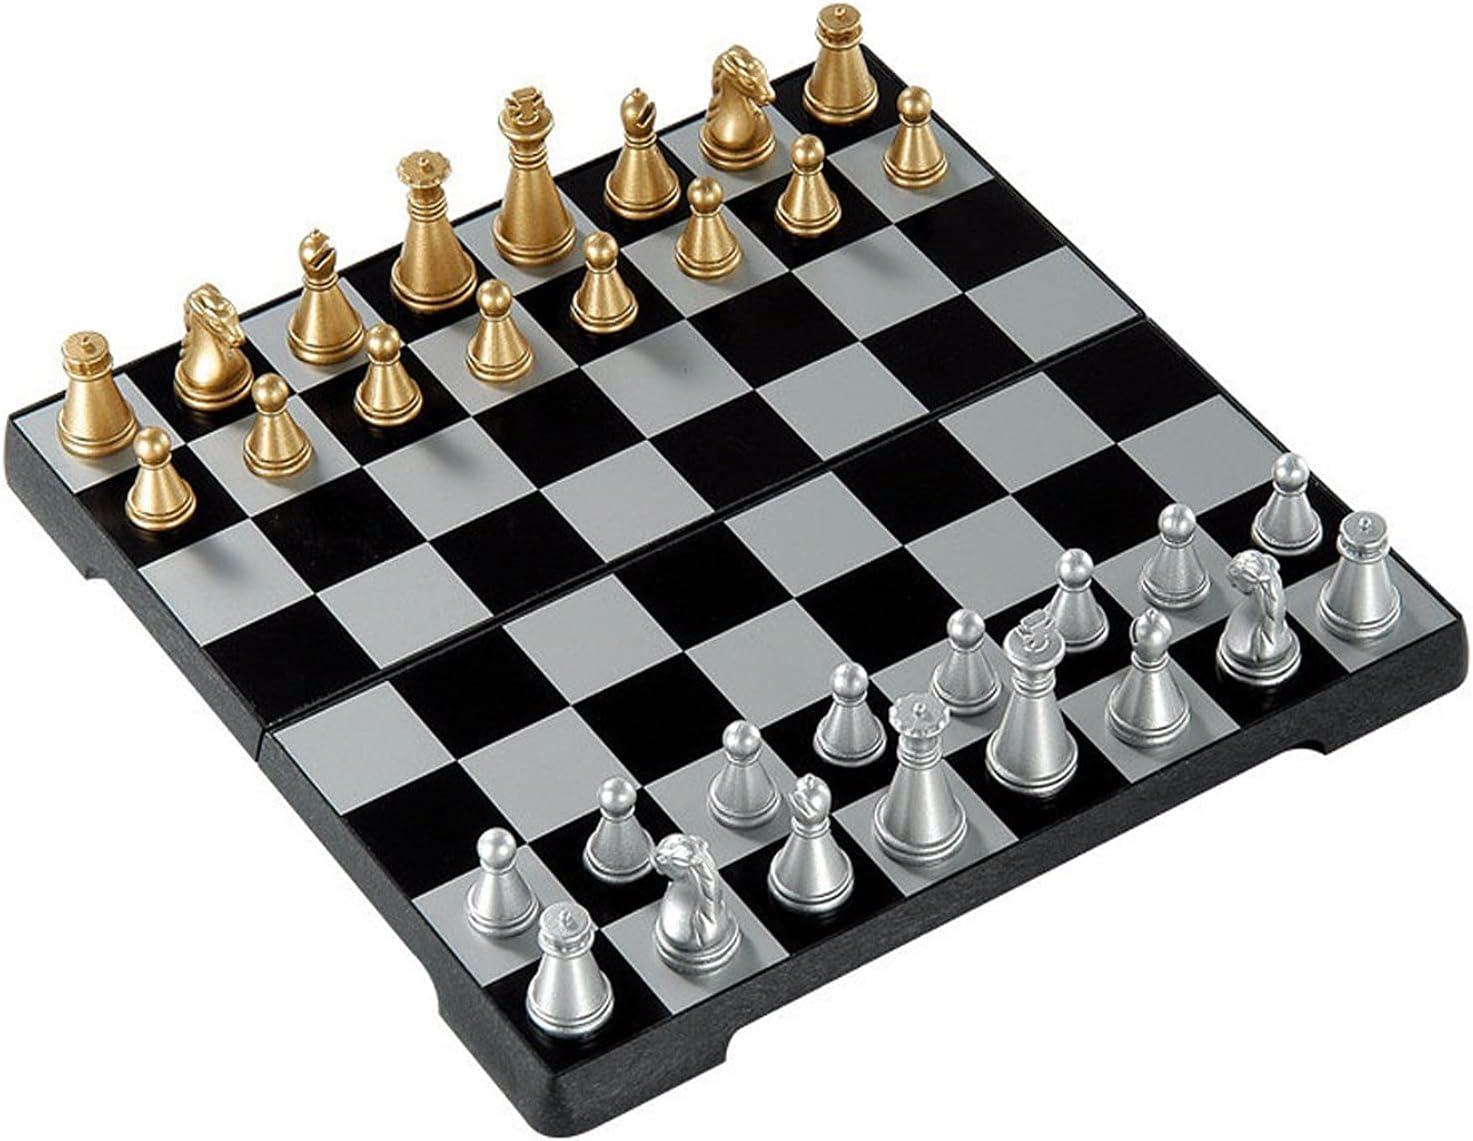 wanhaishop 2021 new Board Games 2.6 X 2021 new Plastic Inches Foldab Chess Set